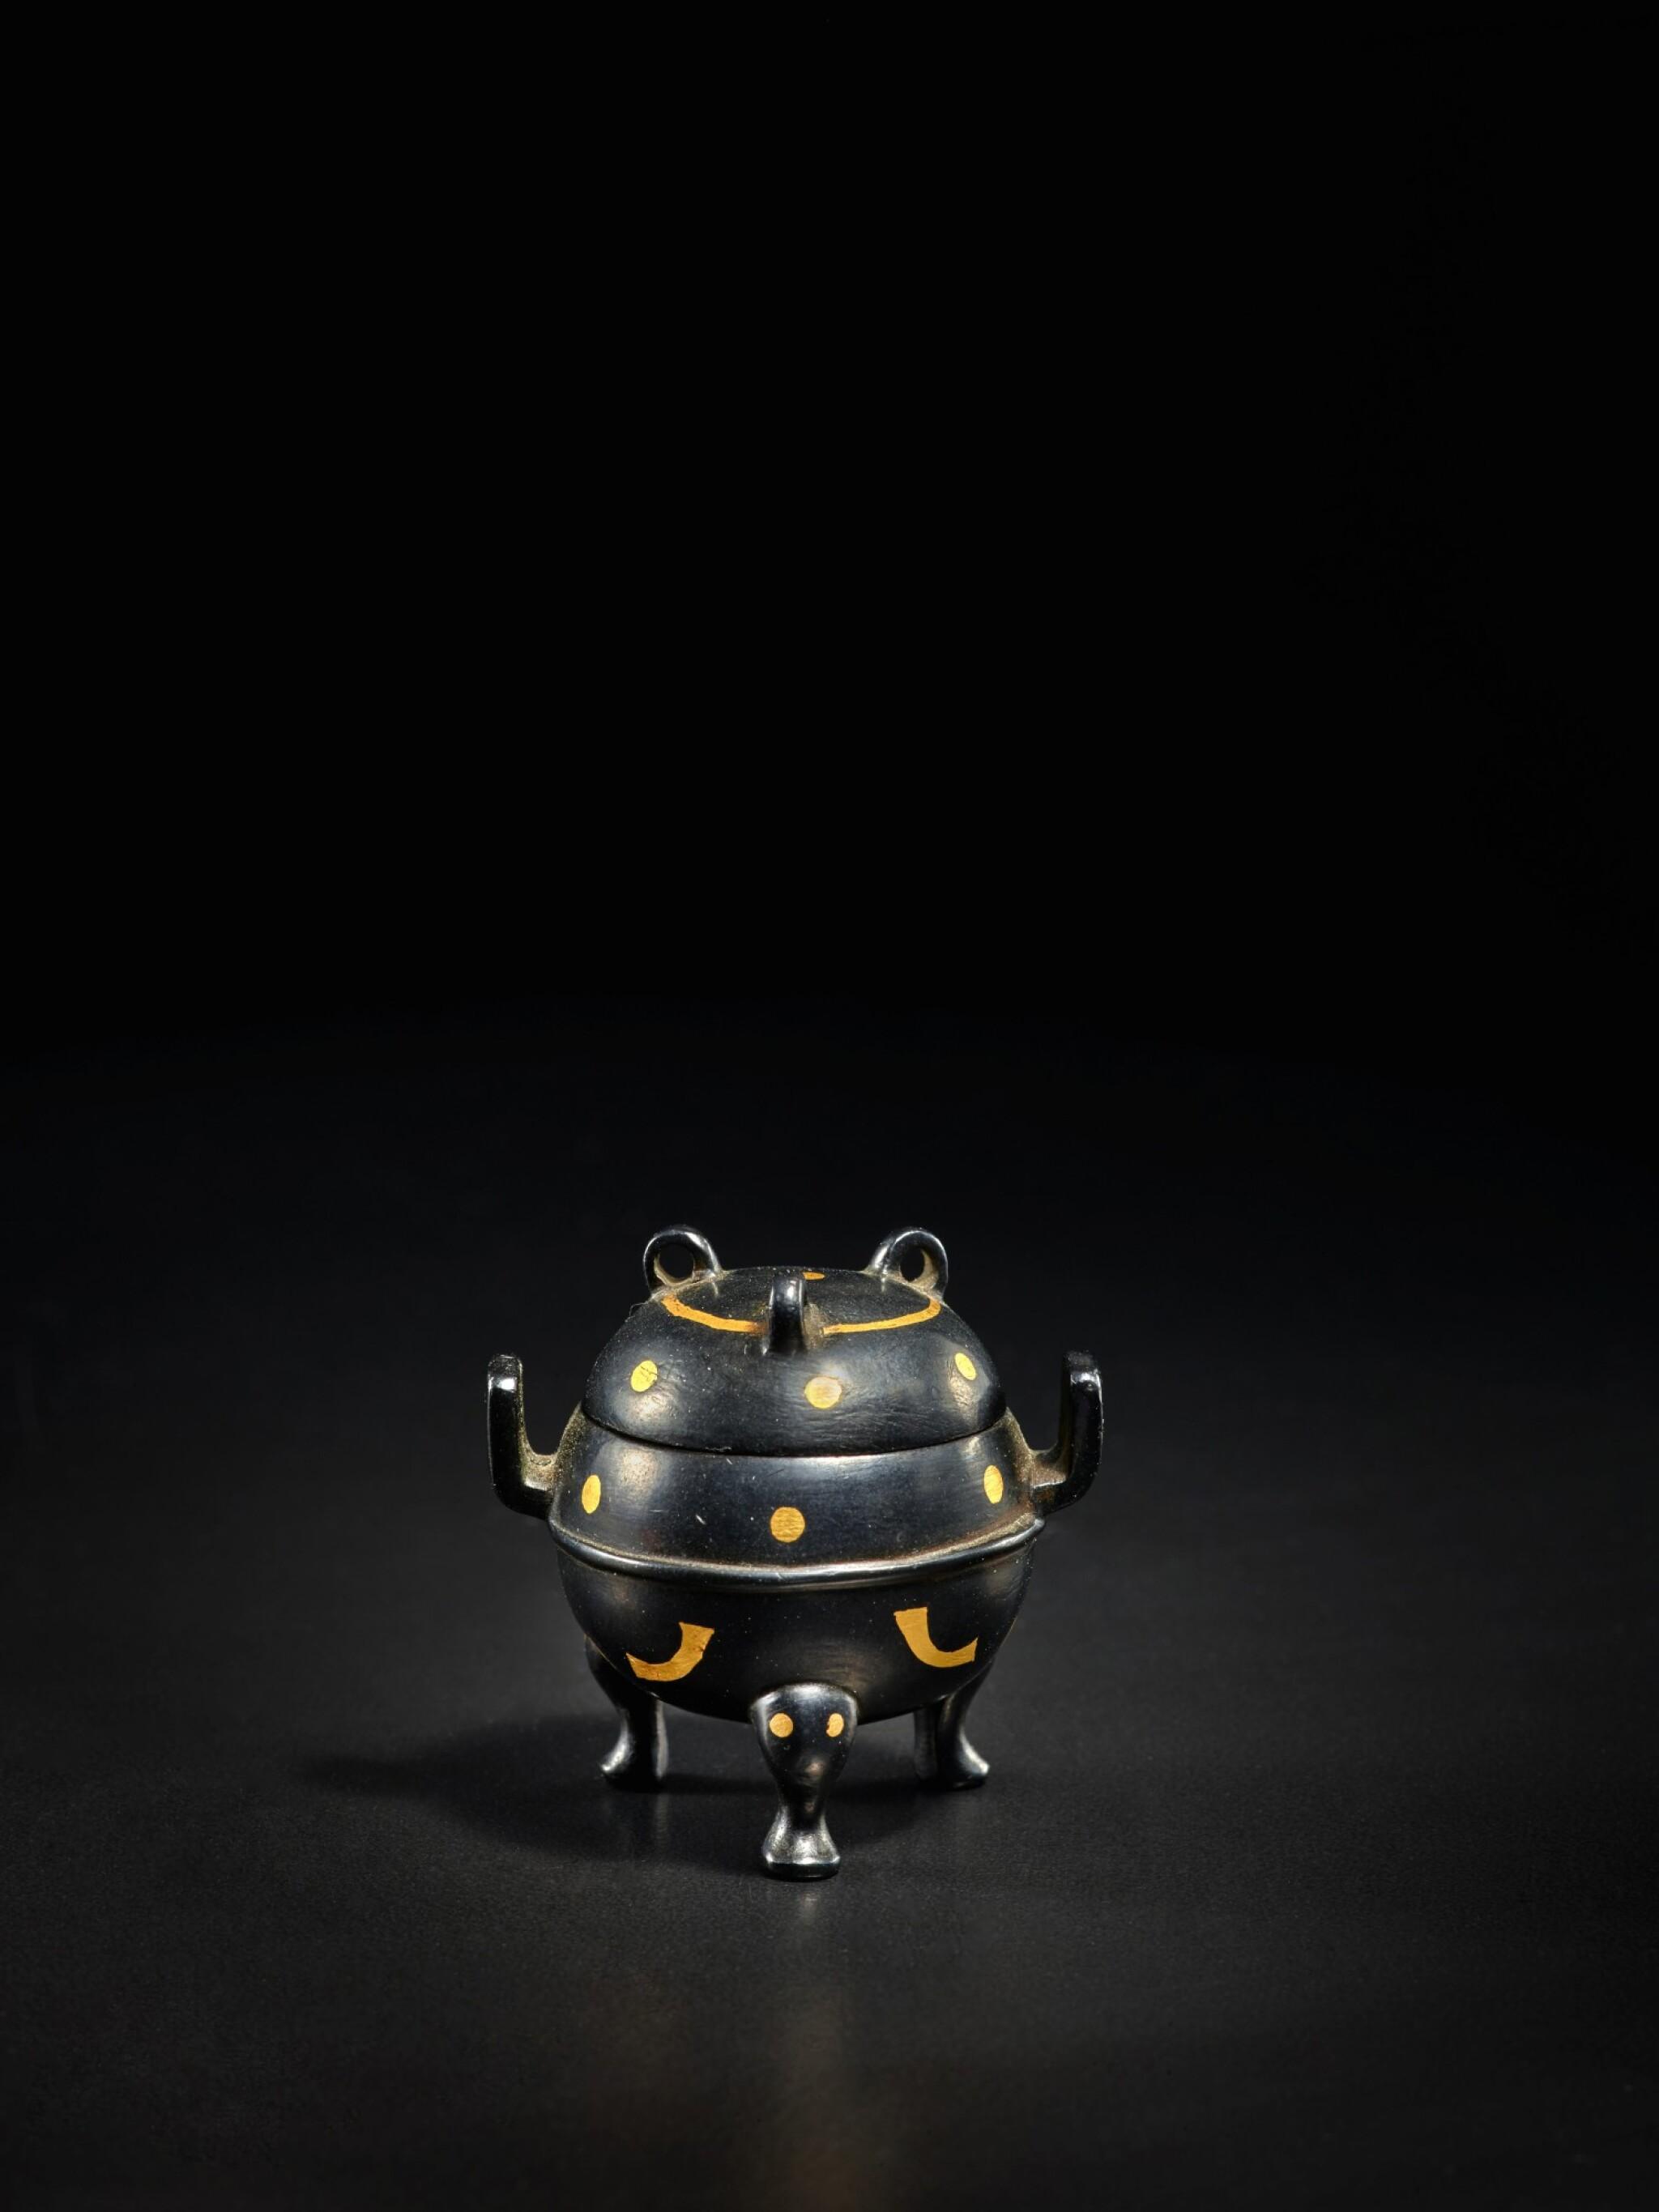 View full screen - View 1 of Lot 123. A miniature archaistic parcel-gilt bronze tripod censer and cover, Song - Ming Dynasty   宋至明 銅局部鎏金袖珍仿古三足蓋爐.